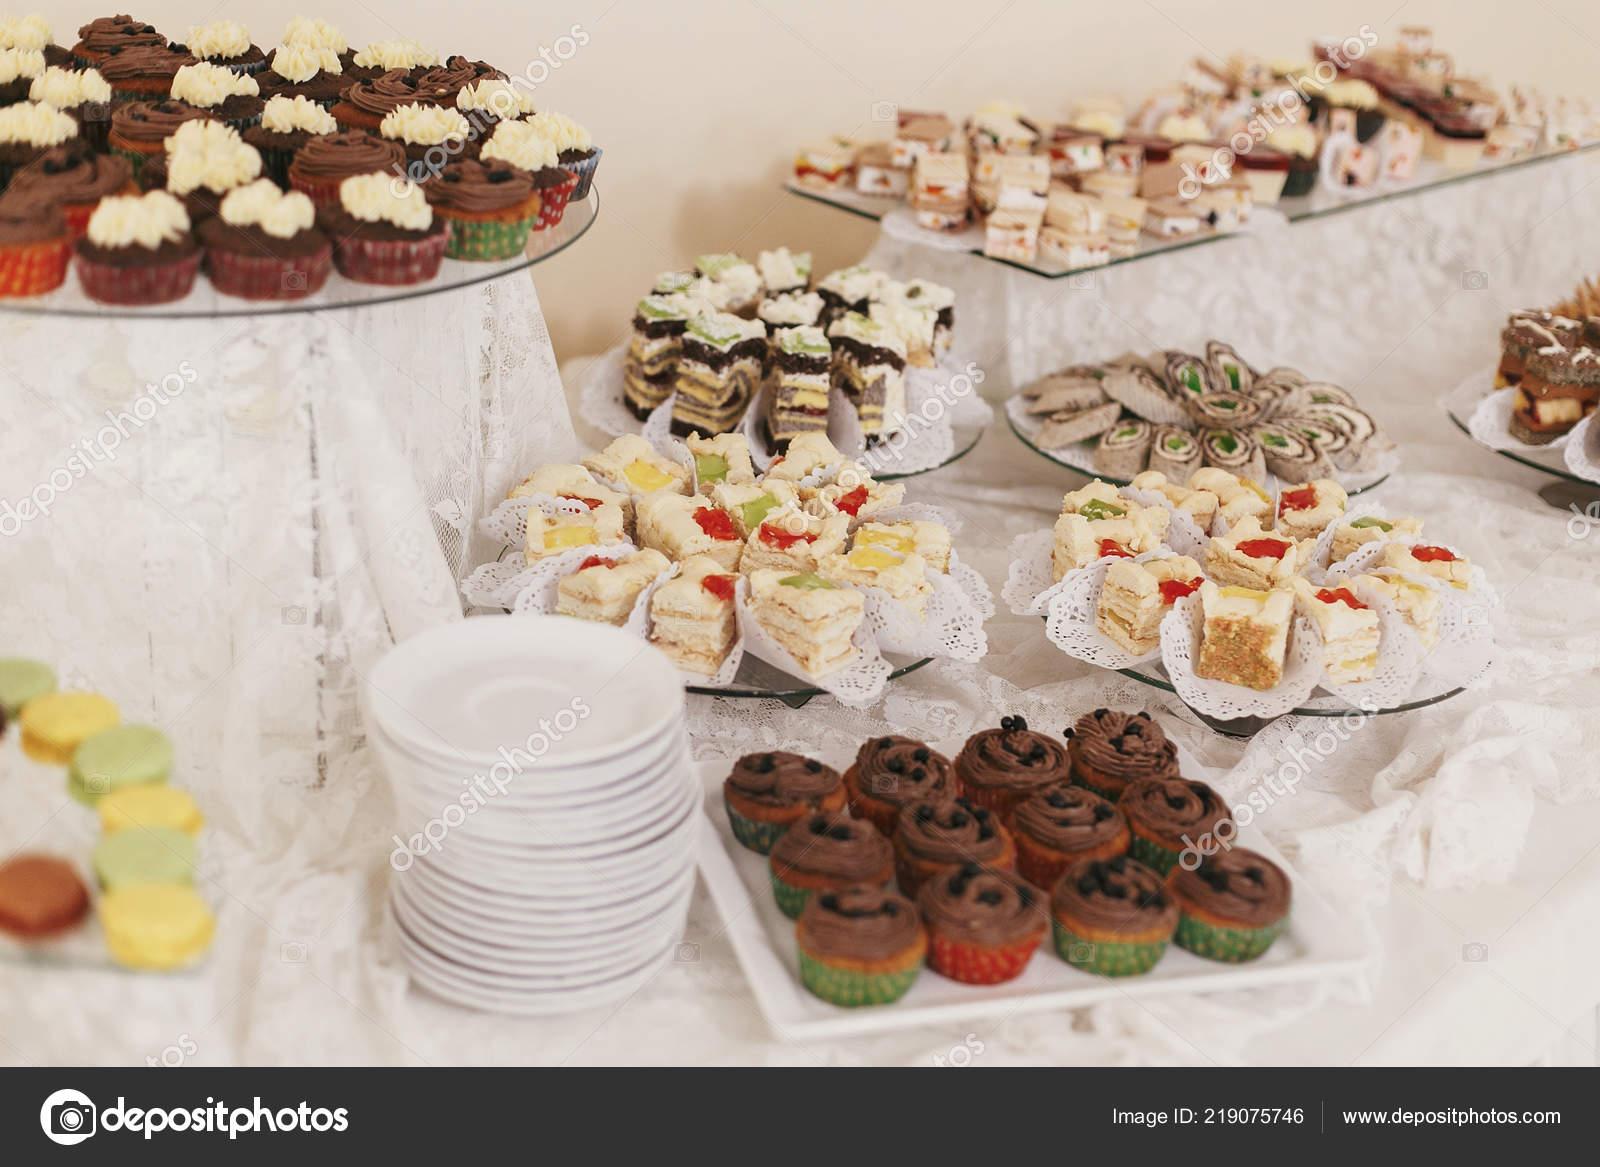 Delicious Table Desserts Macarons Wedding Reception Restaurant Candy Bar Luxury Stock Photo C Sonyachny 219075746